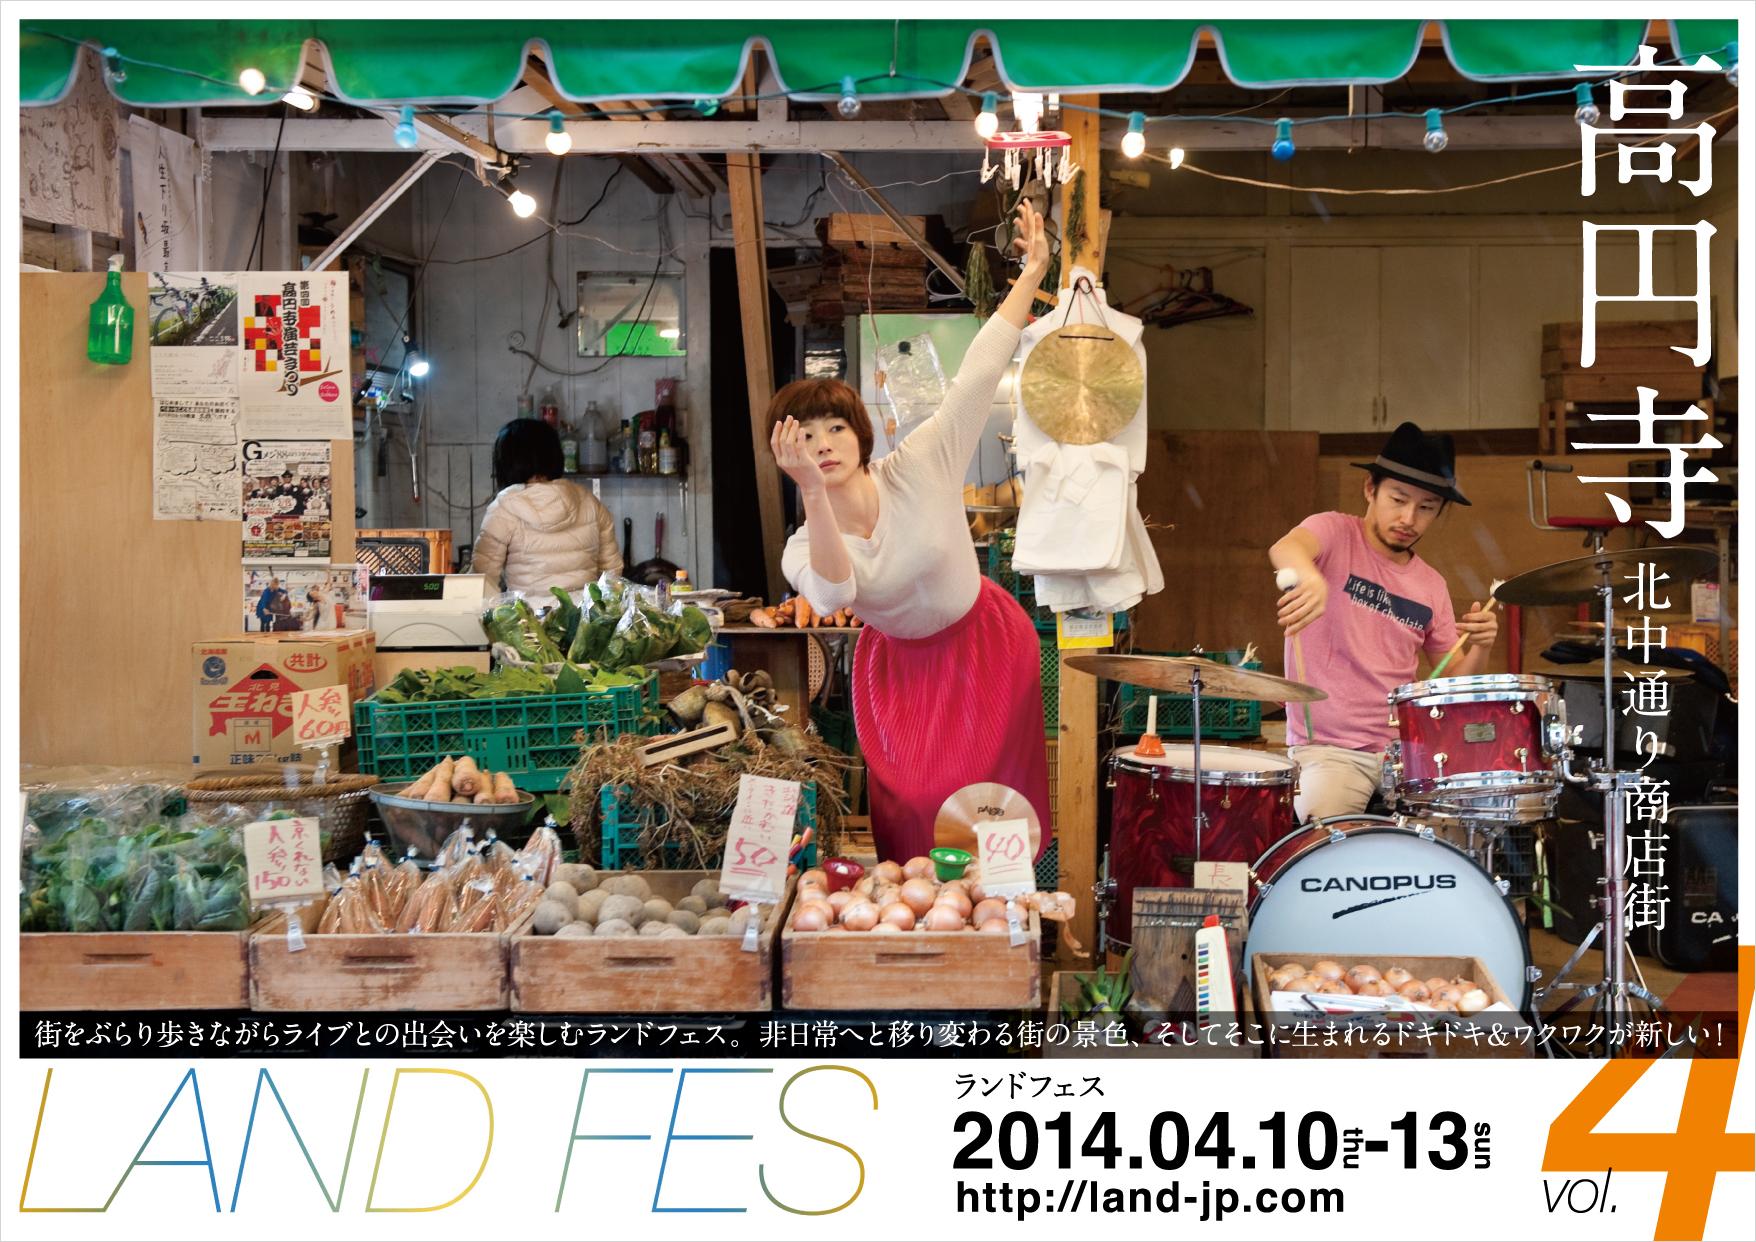 LandFes2014_Flier_omote